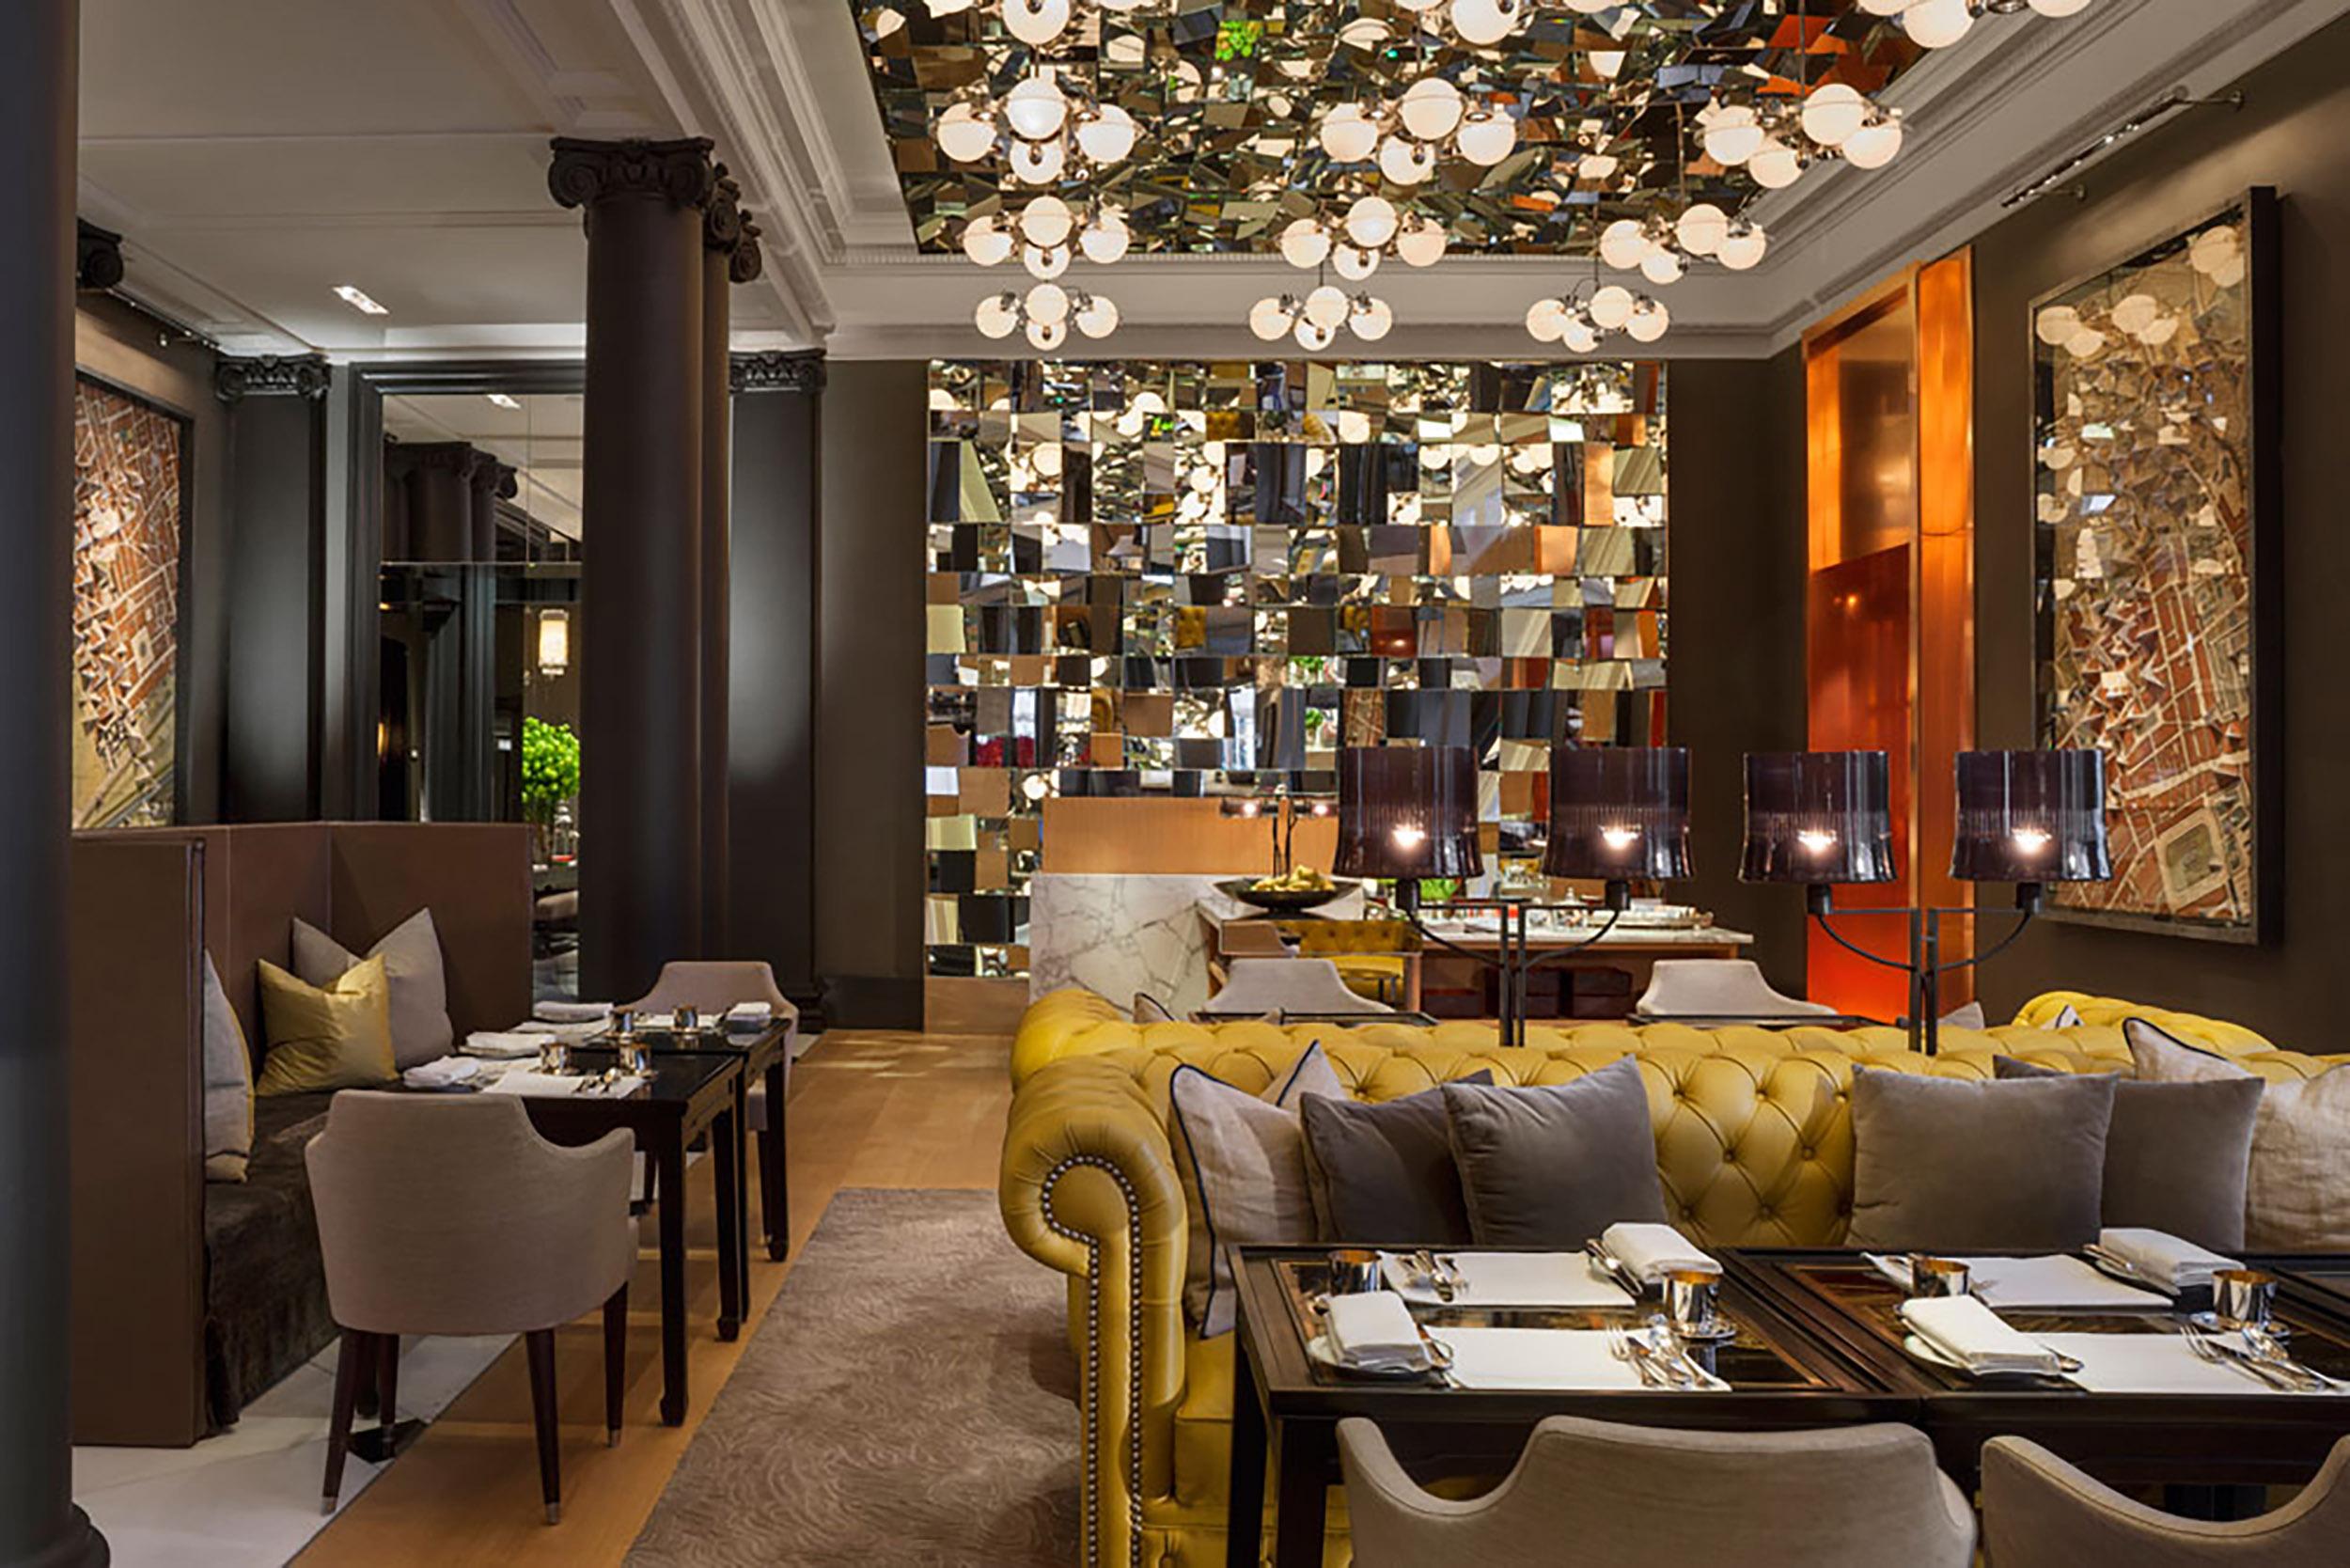 ....bespoke furniture   rosewood london : tea table..特别定制家具   瑰丽伦敦酒店:茶台....